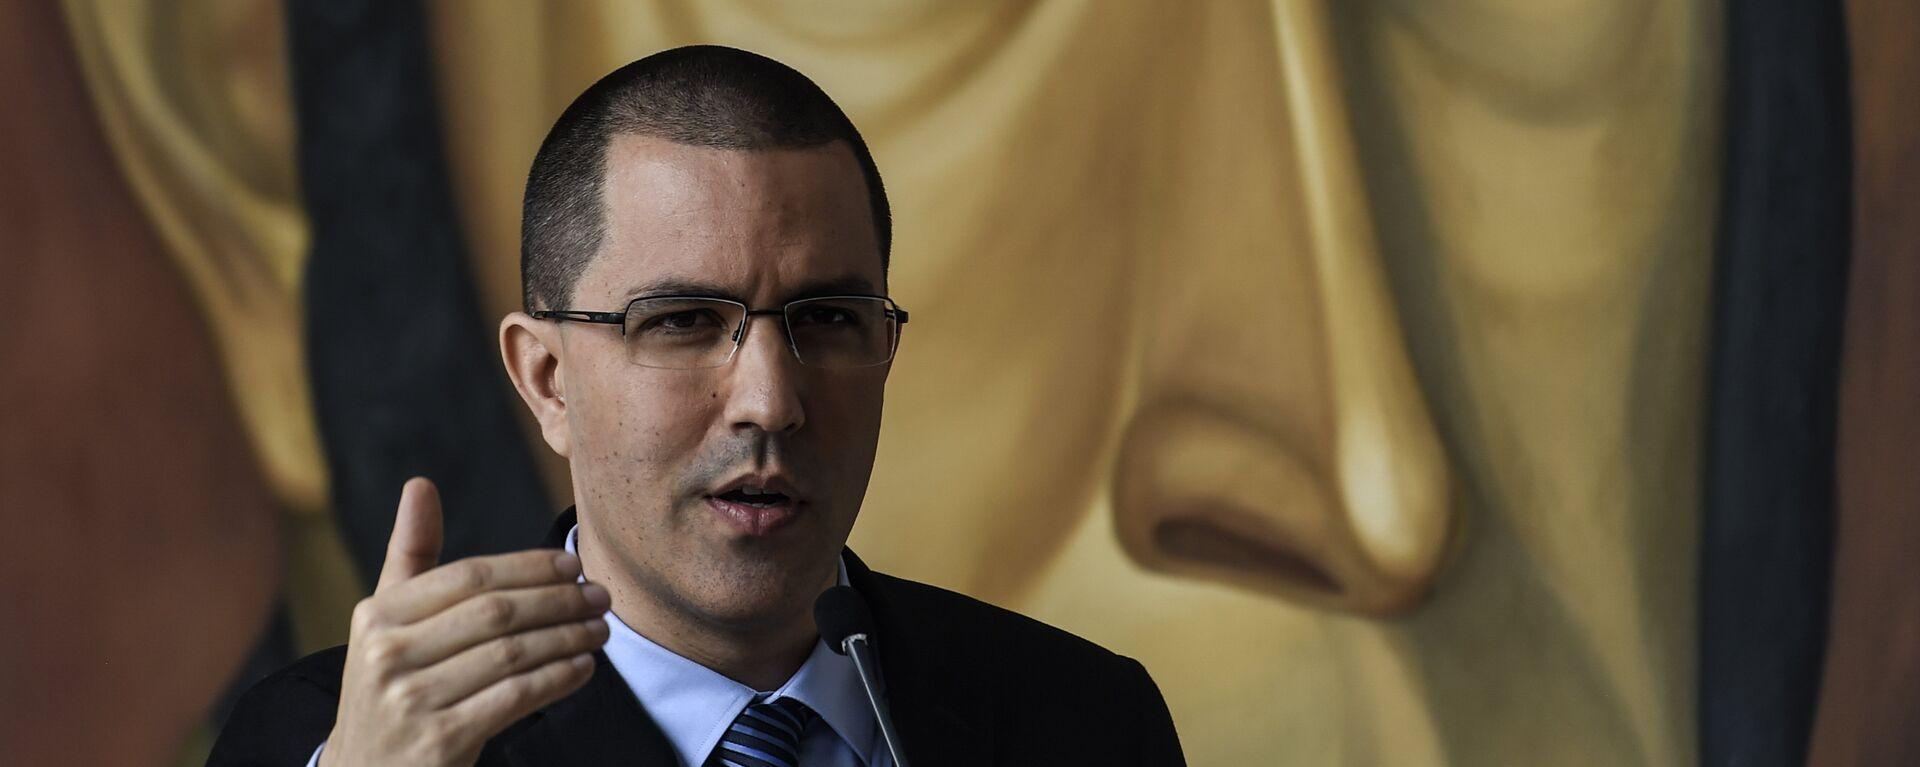 Jorge Arreaza, canciller de Venezuela - Sputnik Mundo, 1920, 29.01.2021